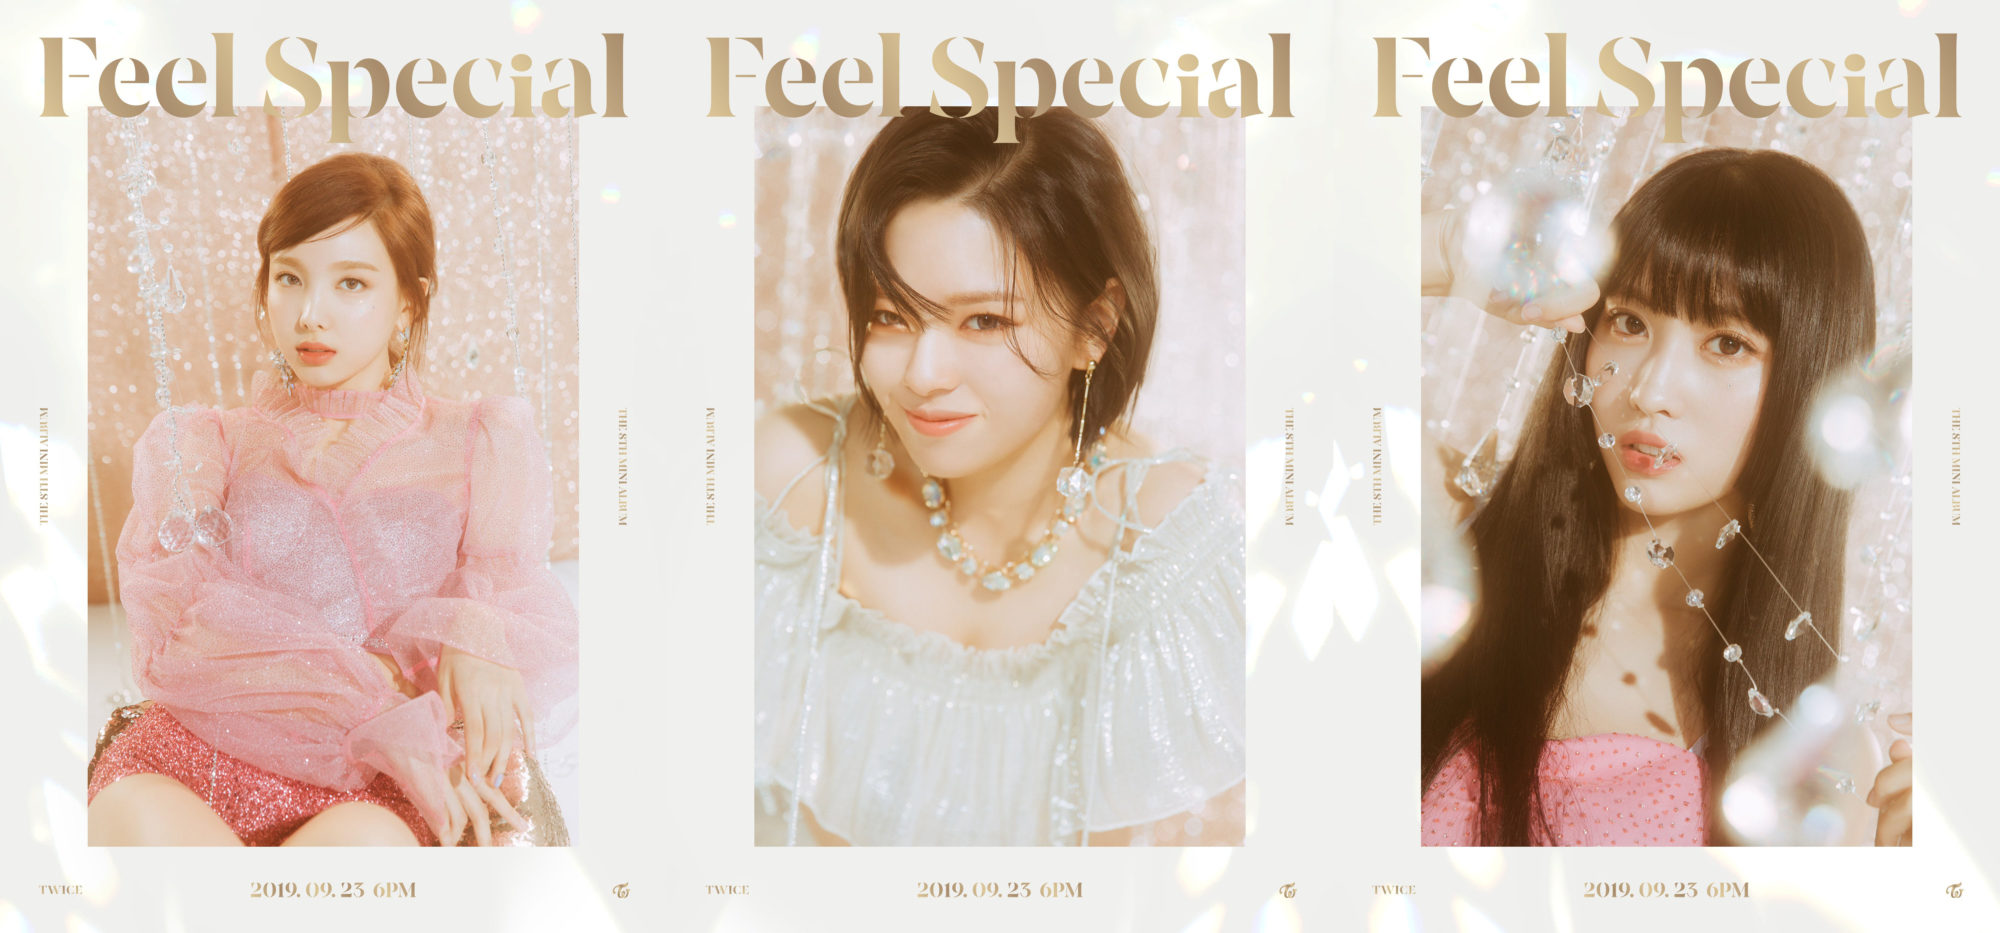 Twice Feel Special Nayeon Jeongyeon Momo Teaser